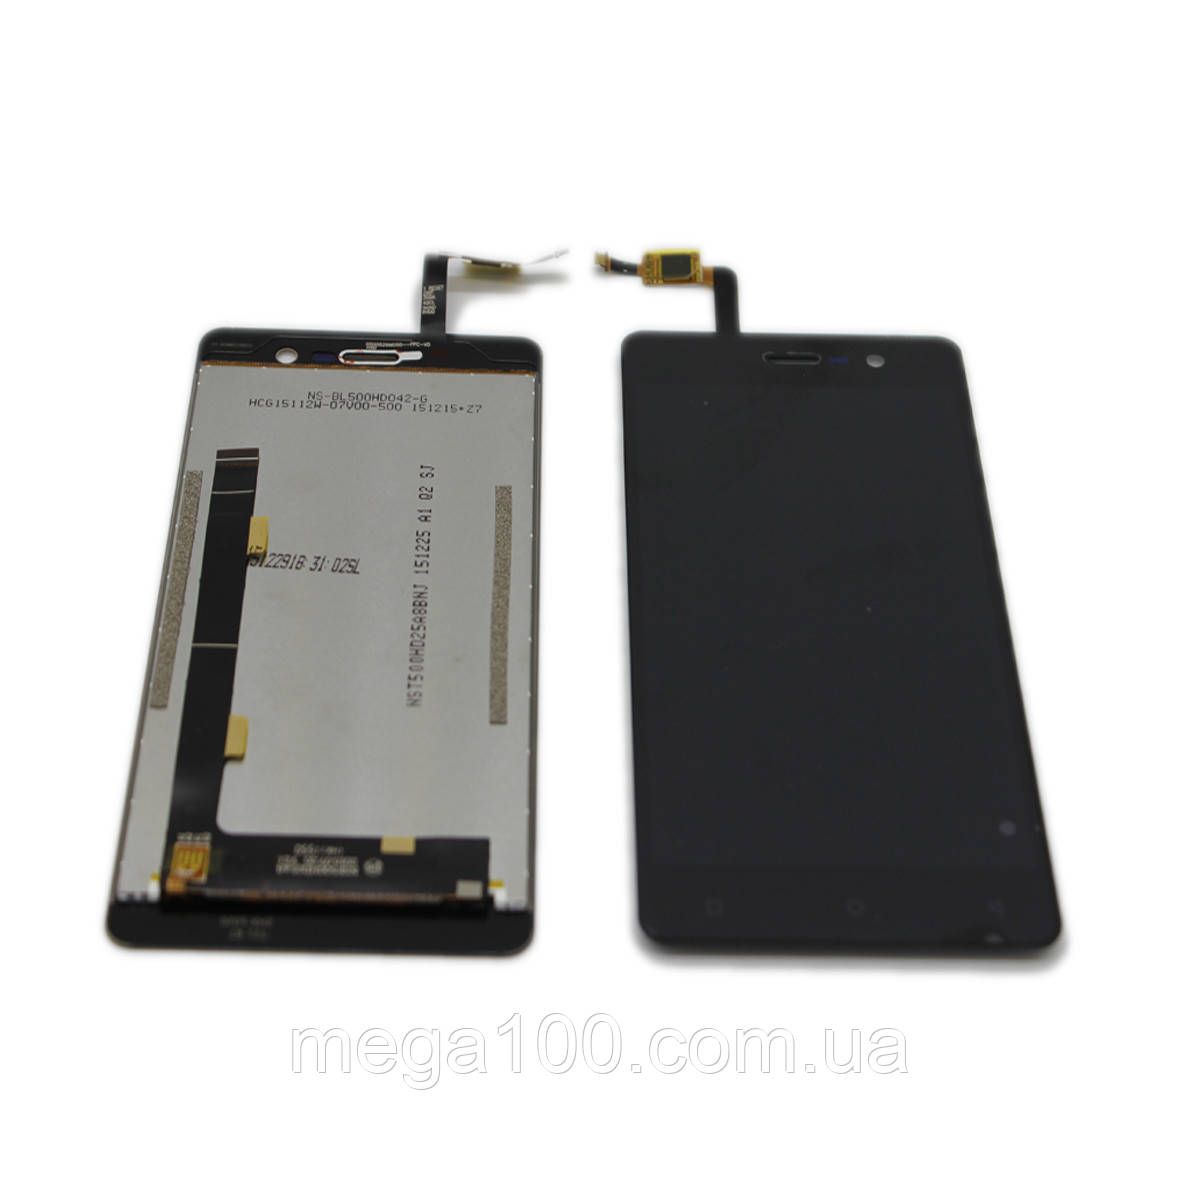 Дисплей + сенсорний экран (модуль) для смартфона Blackview Omega Pro